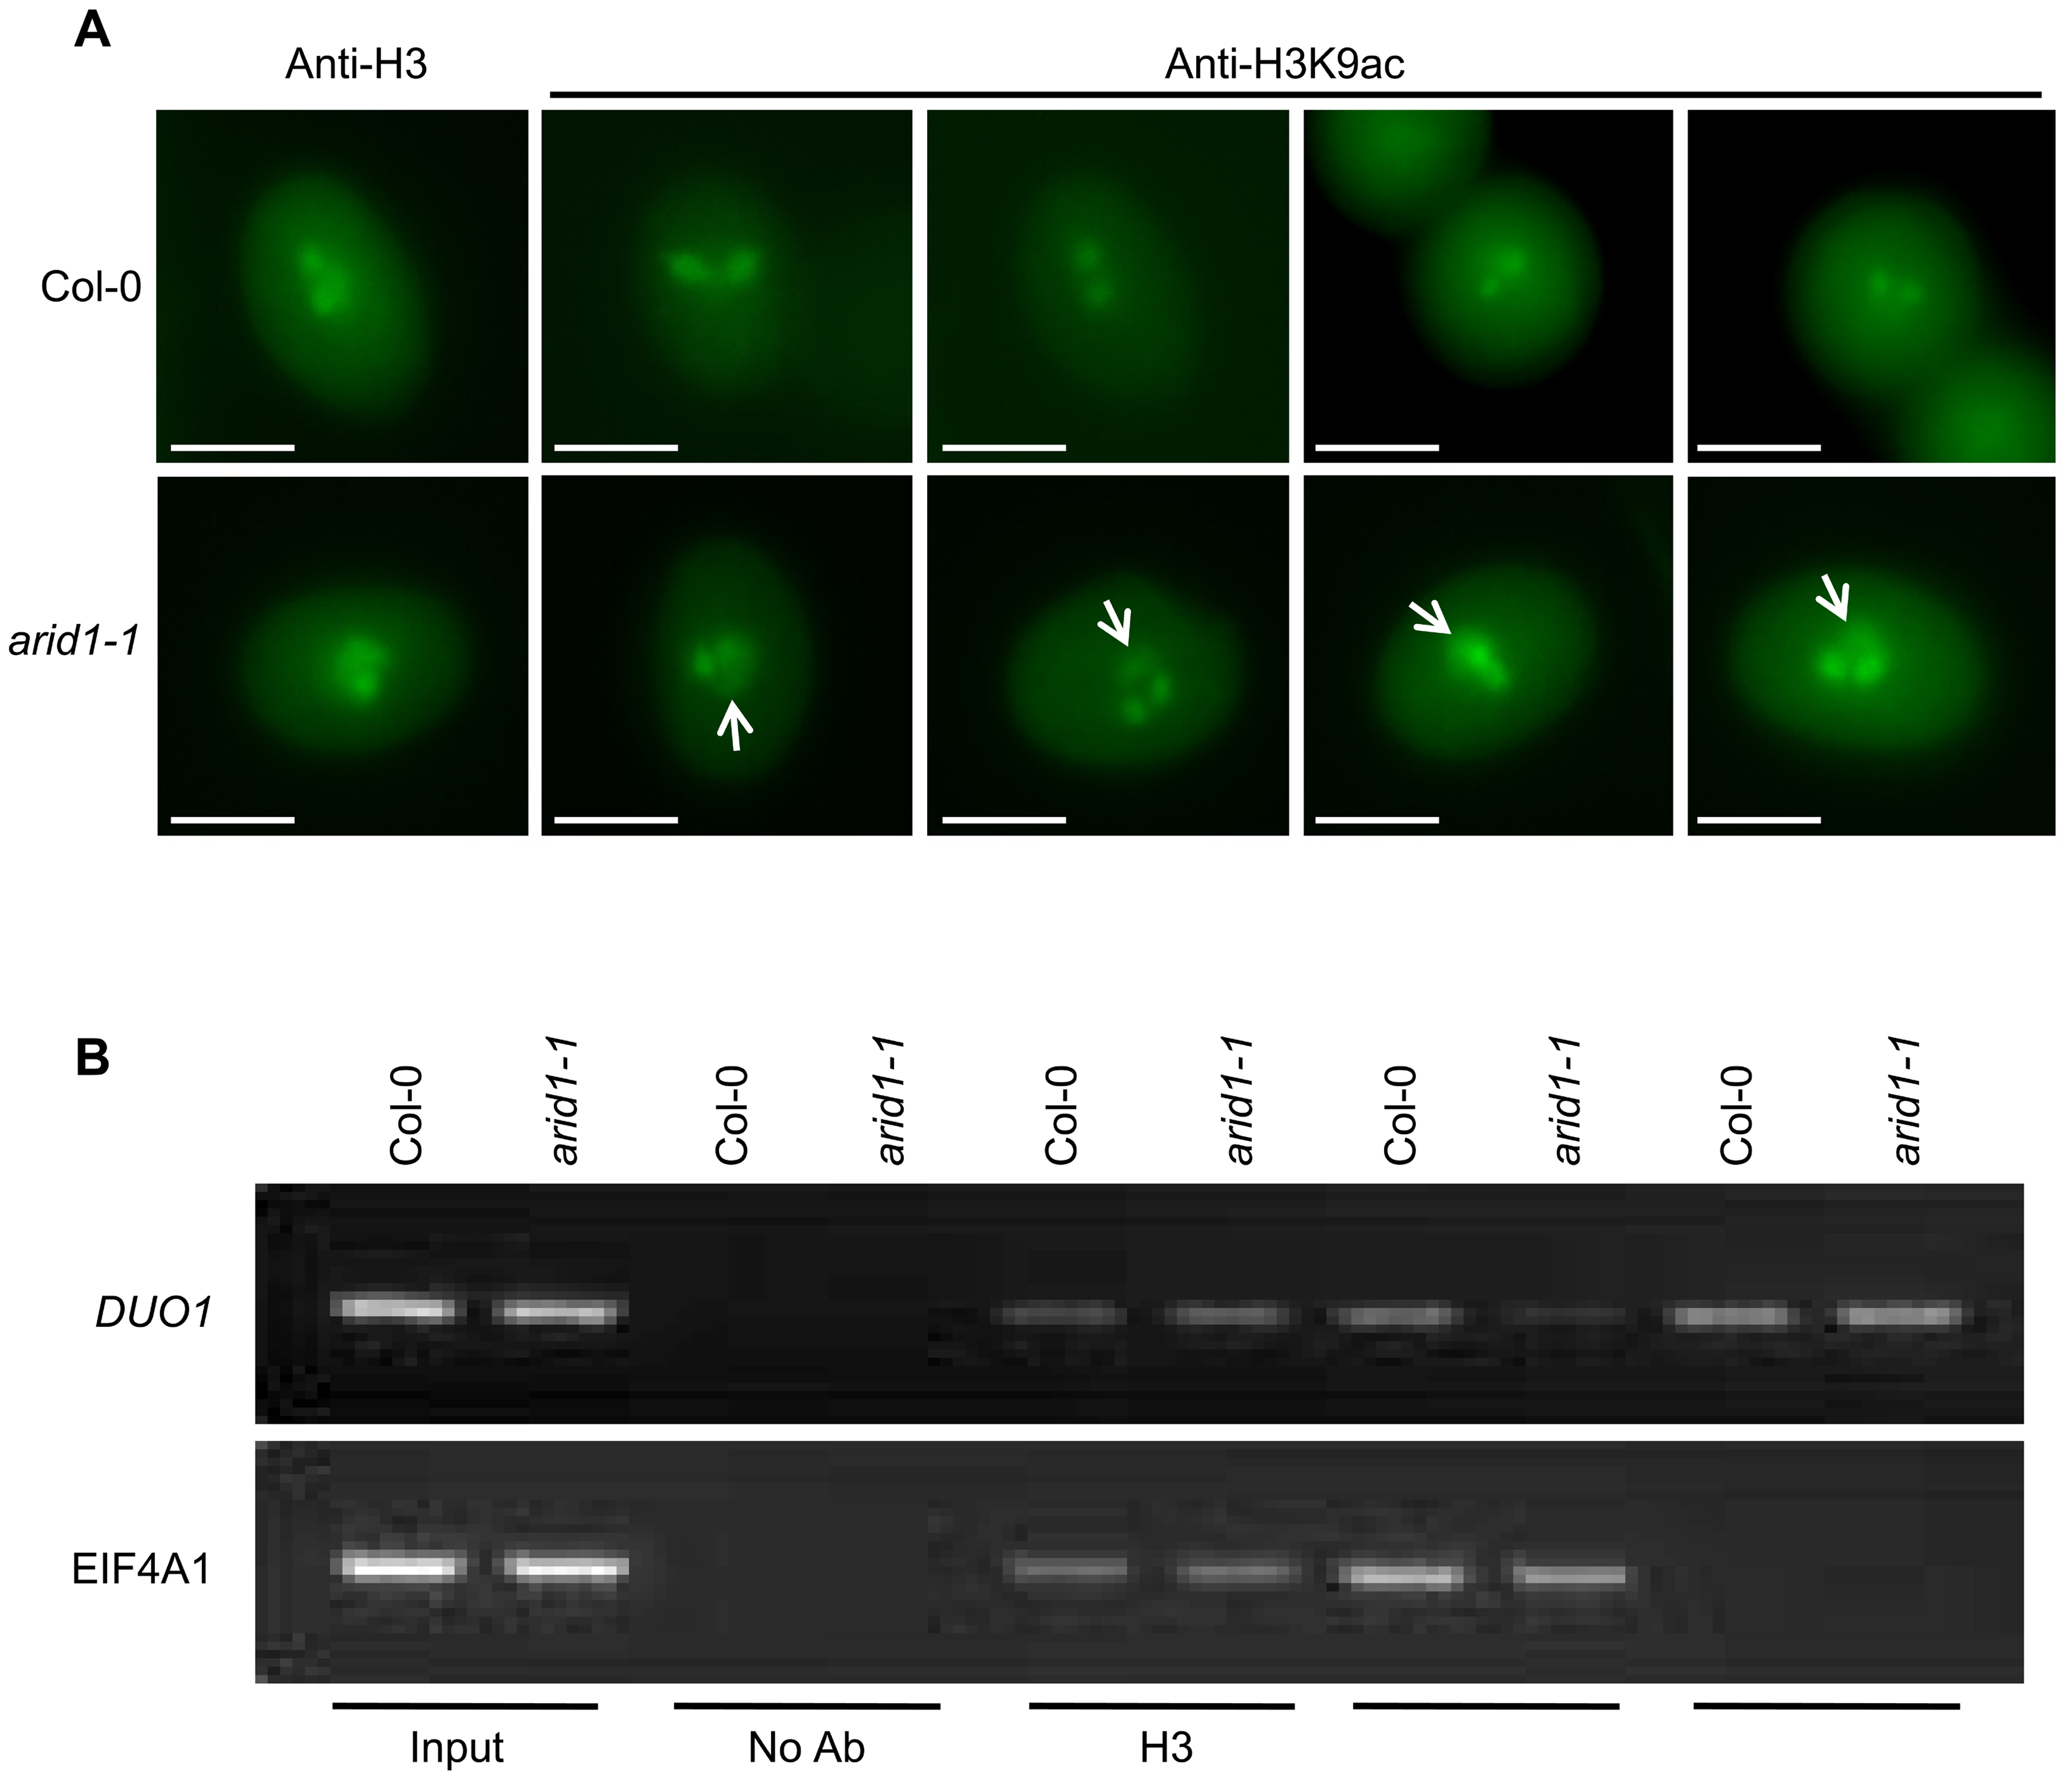 Altered histone acetylation in <i>arid1-1</i>.